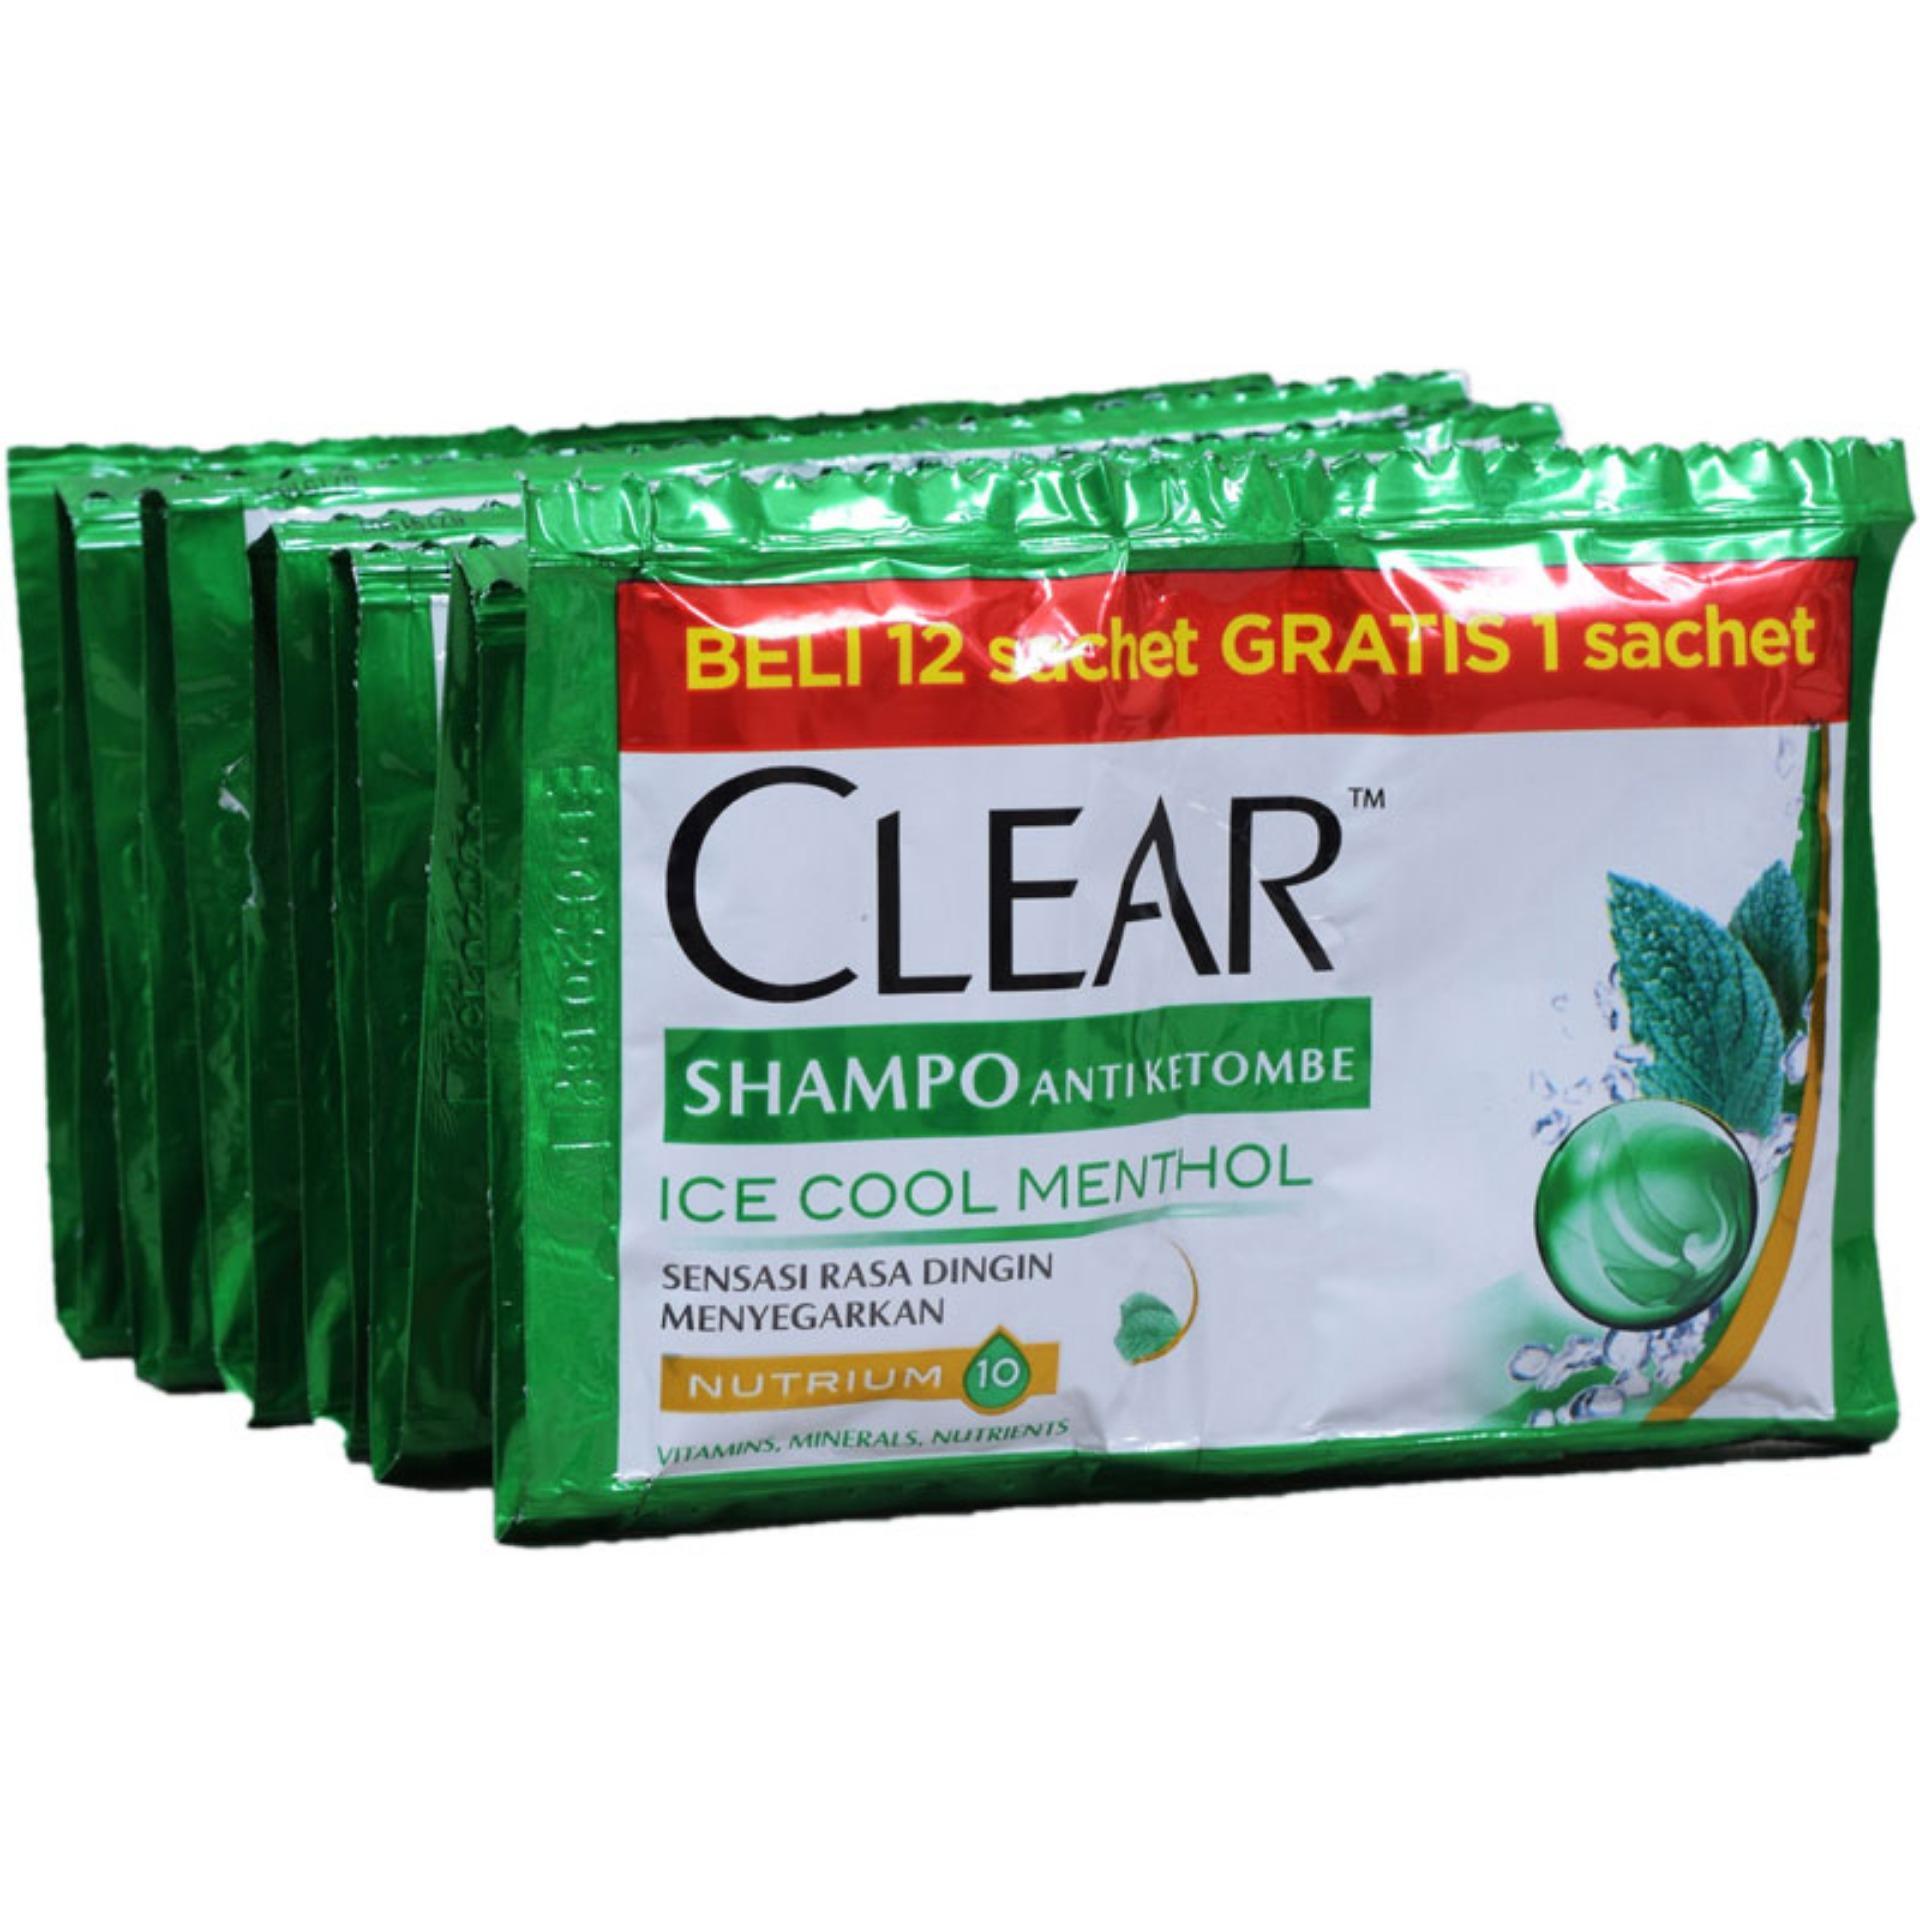 Kelebihan Clear Shampoo Ice Cool Menthol 6x10 Ml Terkini Daftar Head Ampamp Shoulder Sampo 680 2